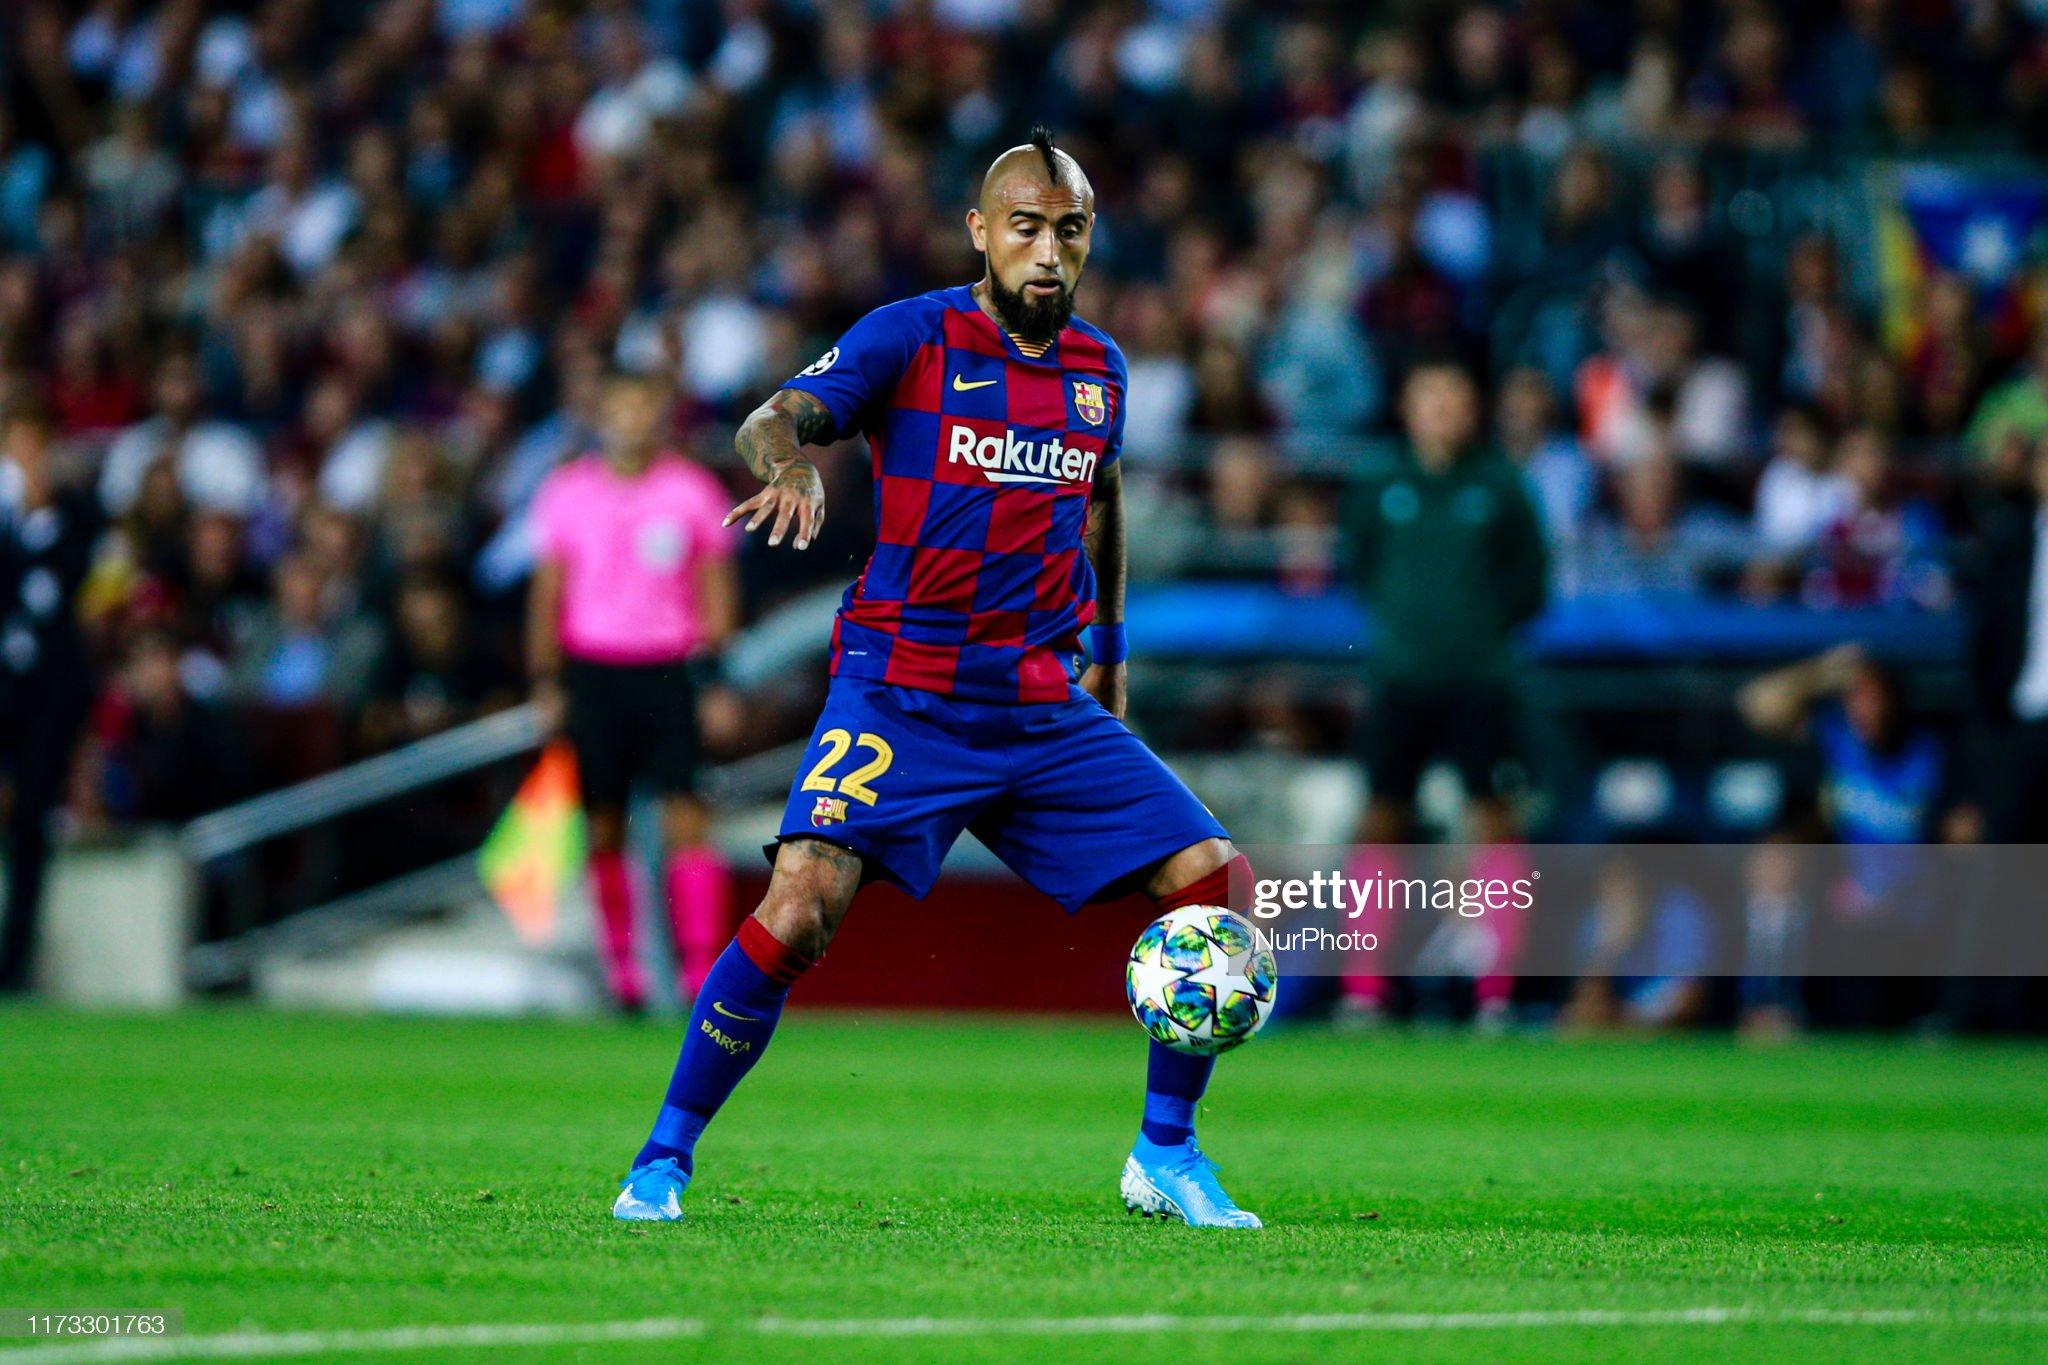 صور مباراة : برشلونة - إنتر 2-1 ( 02-10-2019 )  Arturo-vidal-from-chile-of-fc-barcelona-during-the-uefa-champions-picture-id1173301763?s=2048x2048